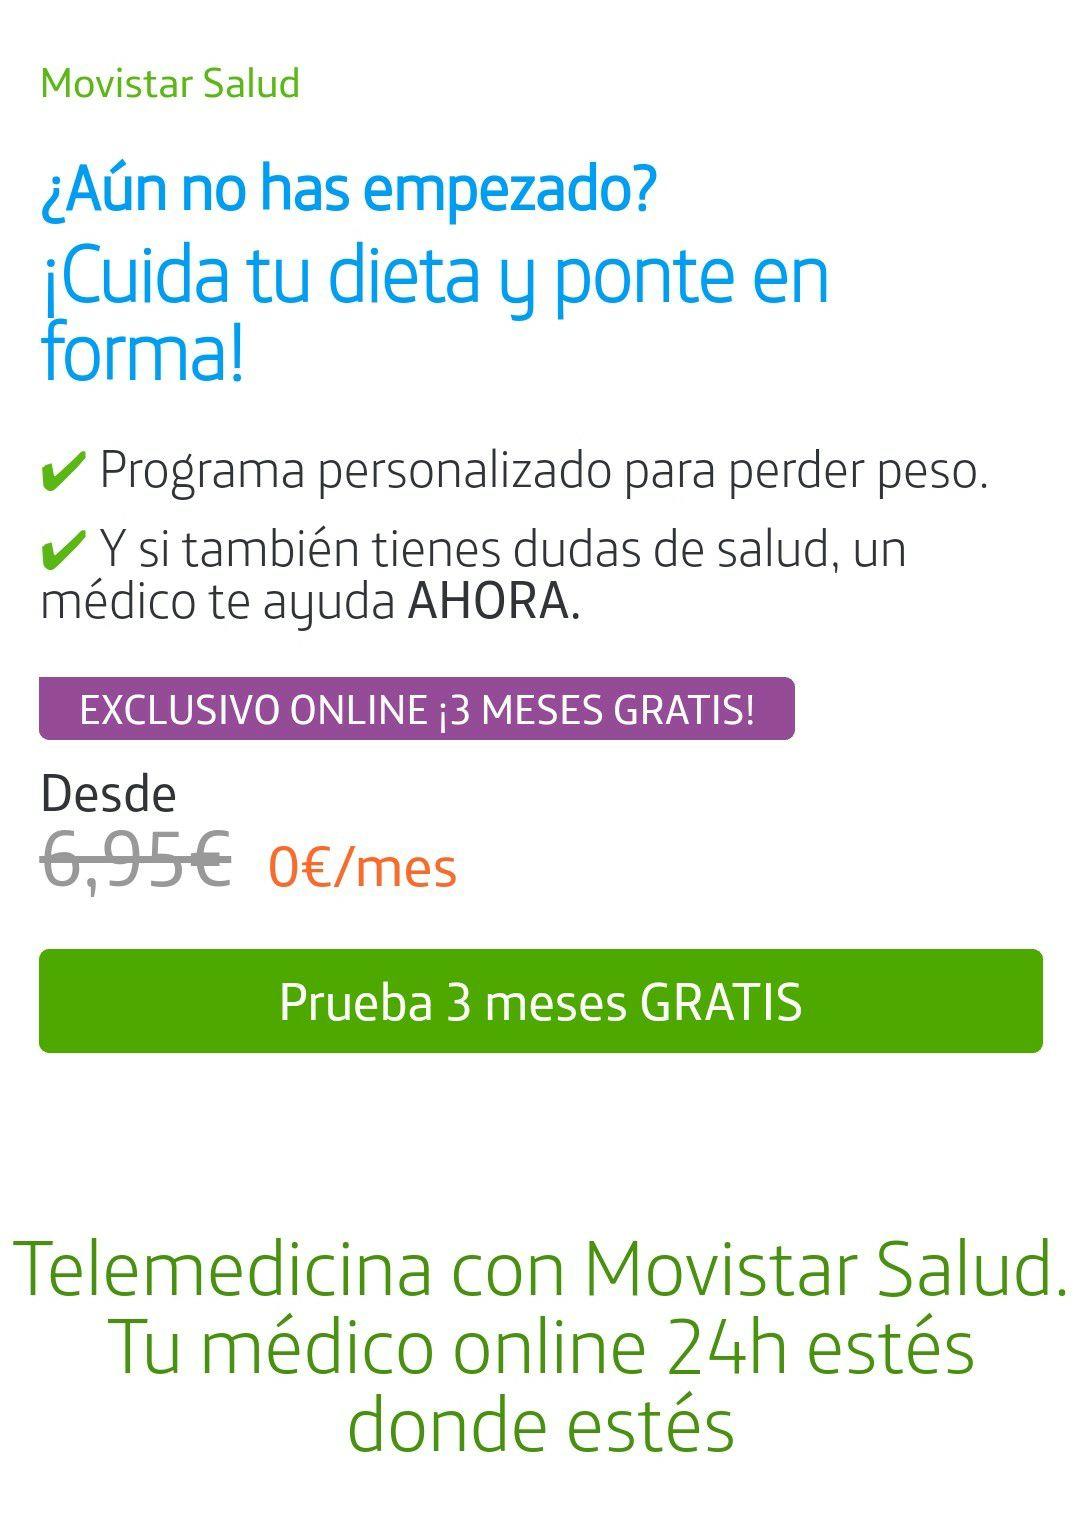 Telemedicina con Movistar Salud. Tu médico online 24h estés donde estés 3 meses gratis